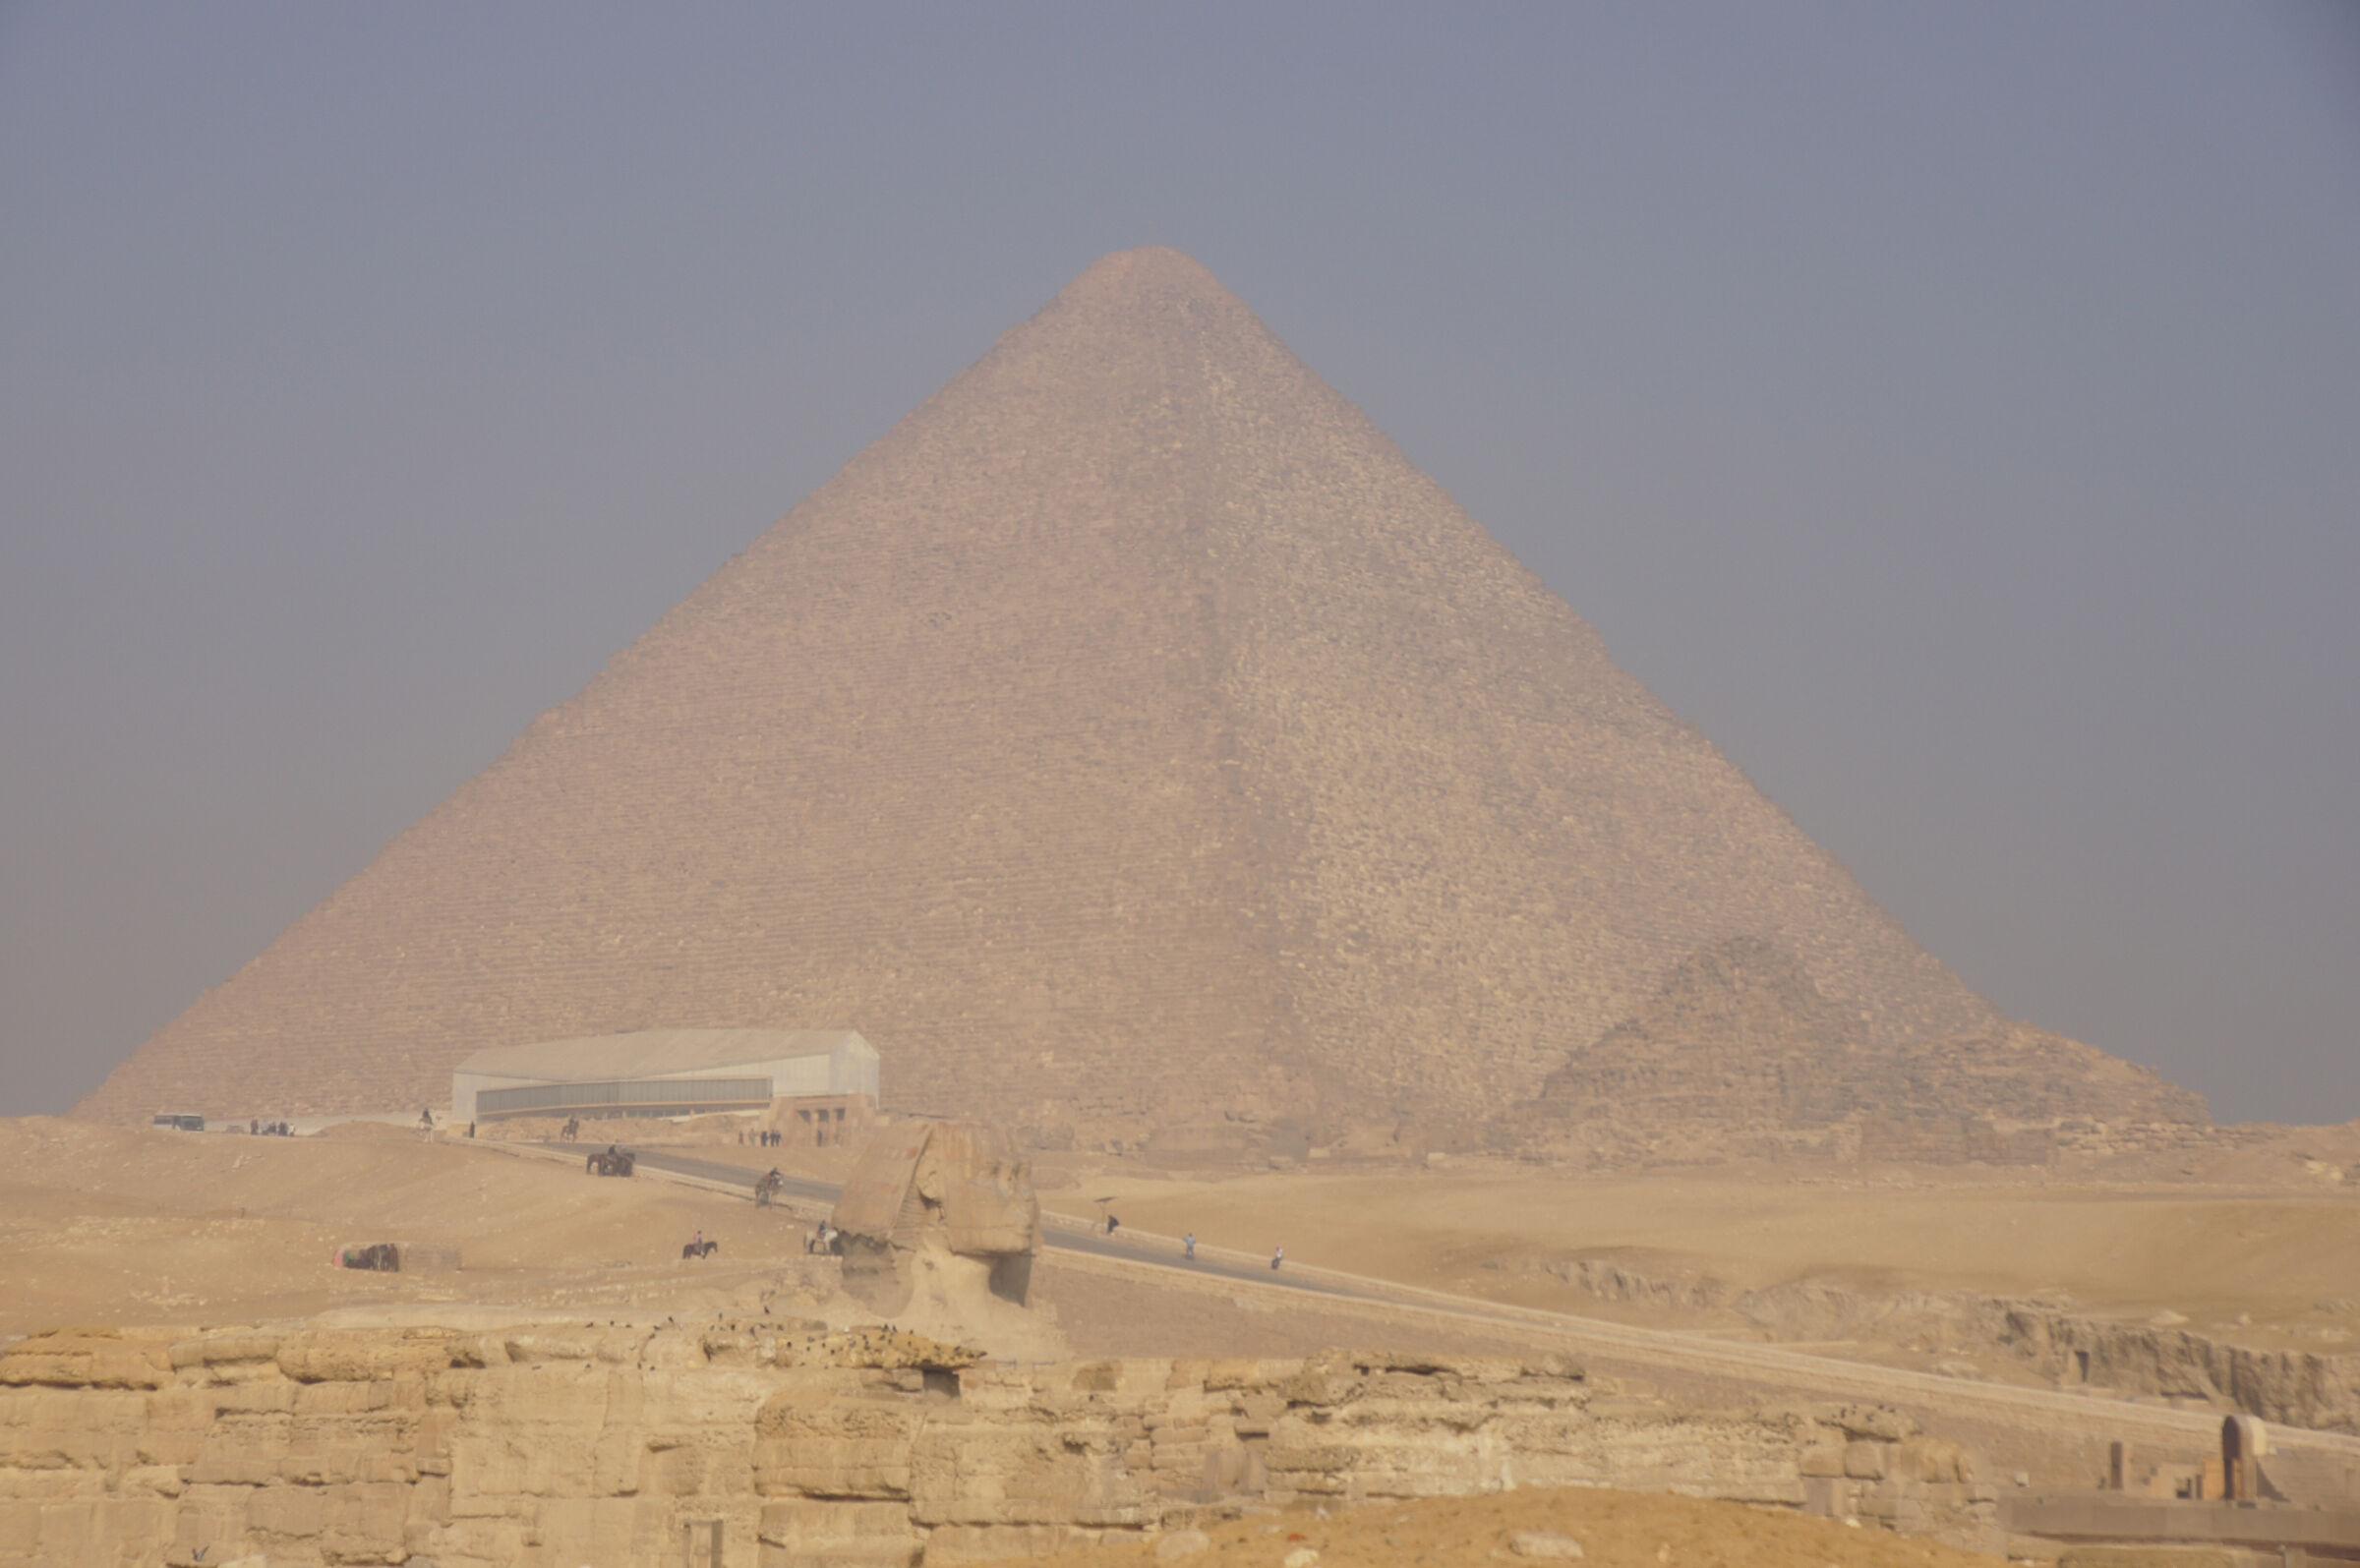 Khufu Pyramid Complex: Site: Giza; View: Khufu Pyramid, Sphinx, Khufu Boat Museum, G I-c, G I-b